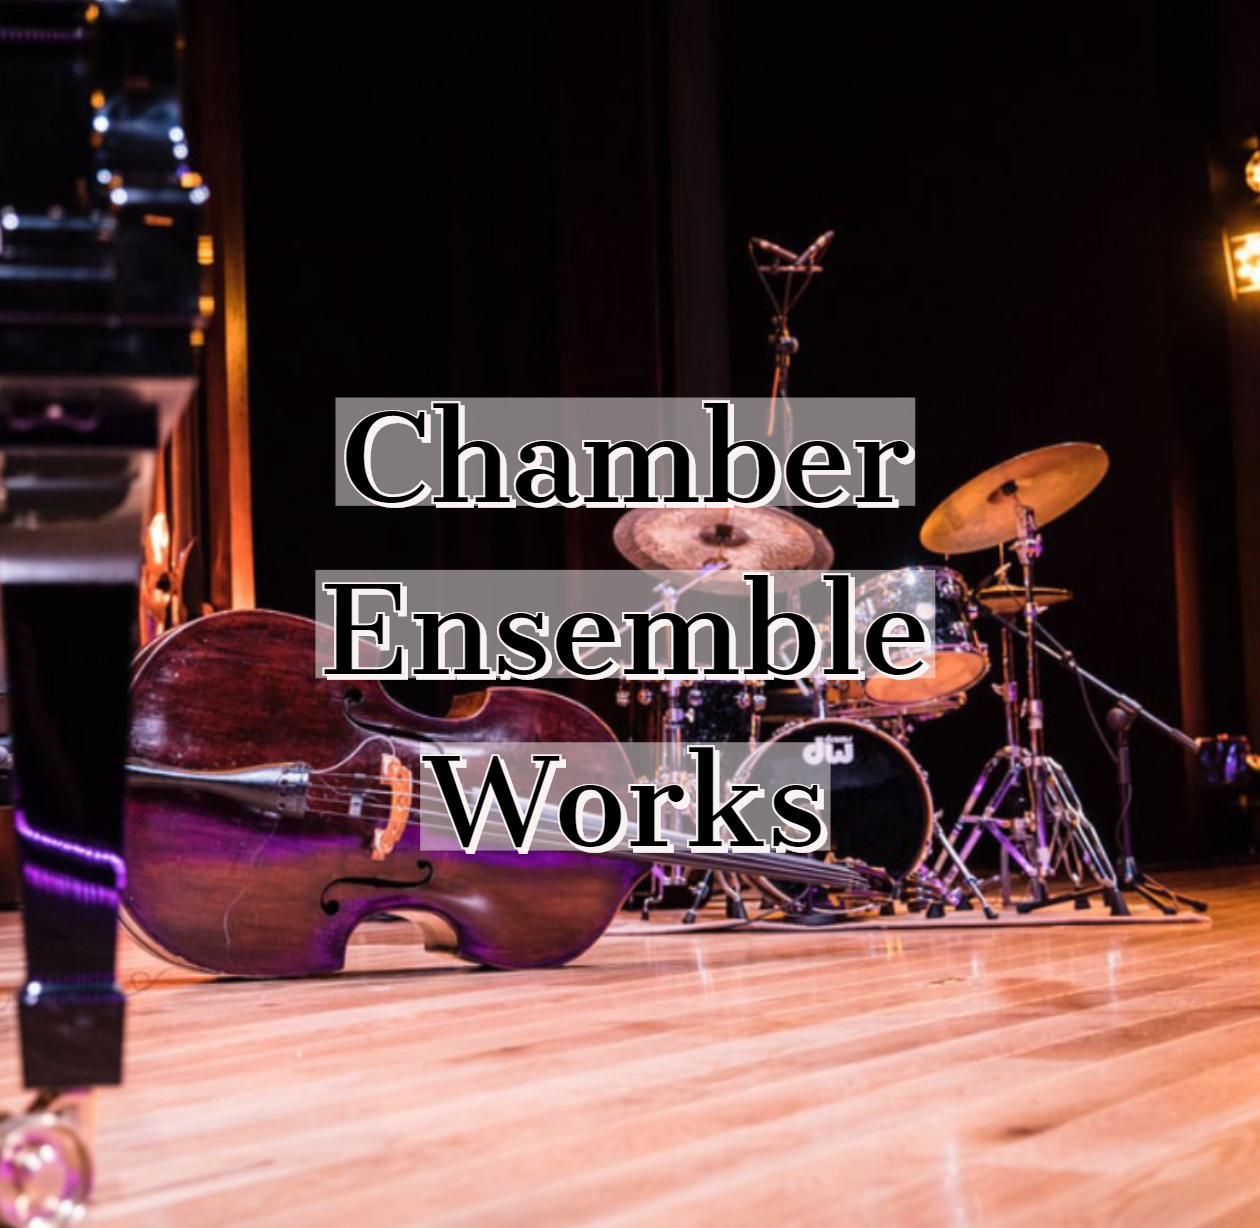 Chamber Ensemble Works